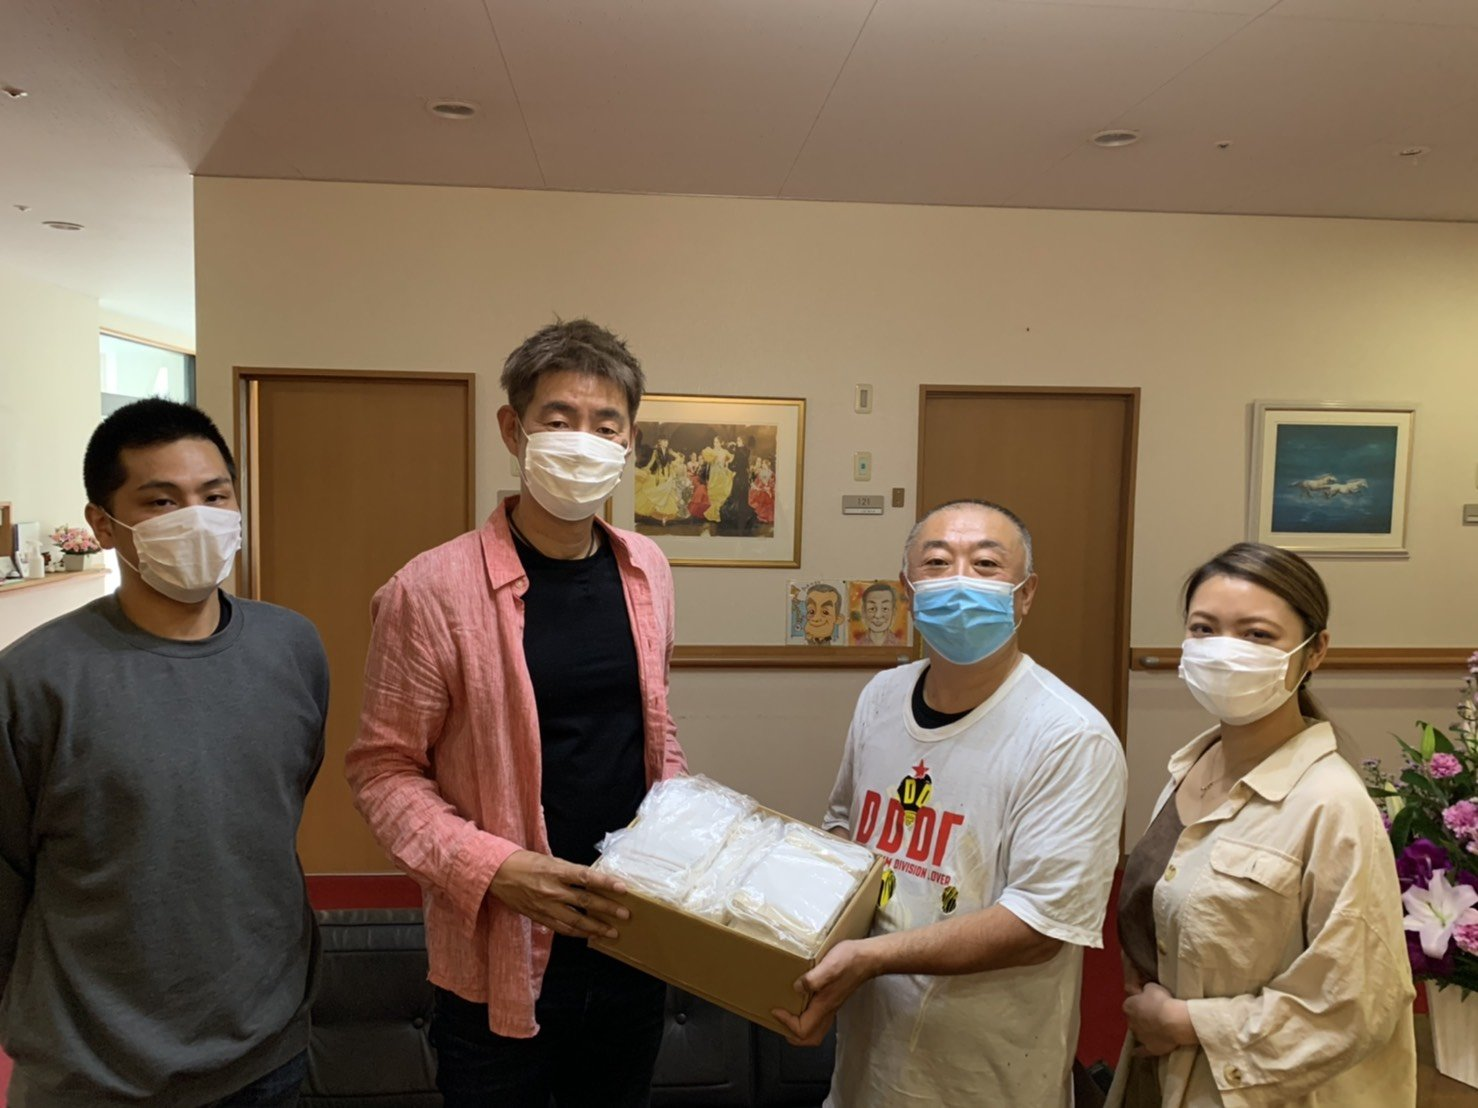 https://www.furusatoen.jp/blog/official/2020/05/S__9764867.jpg